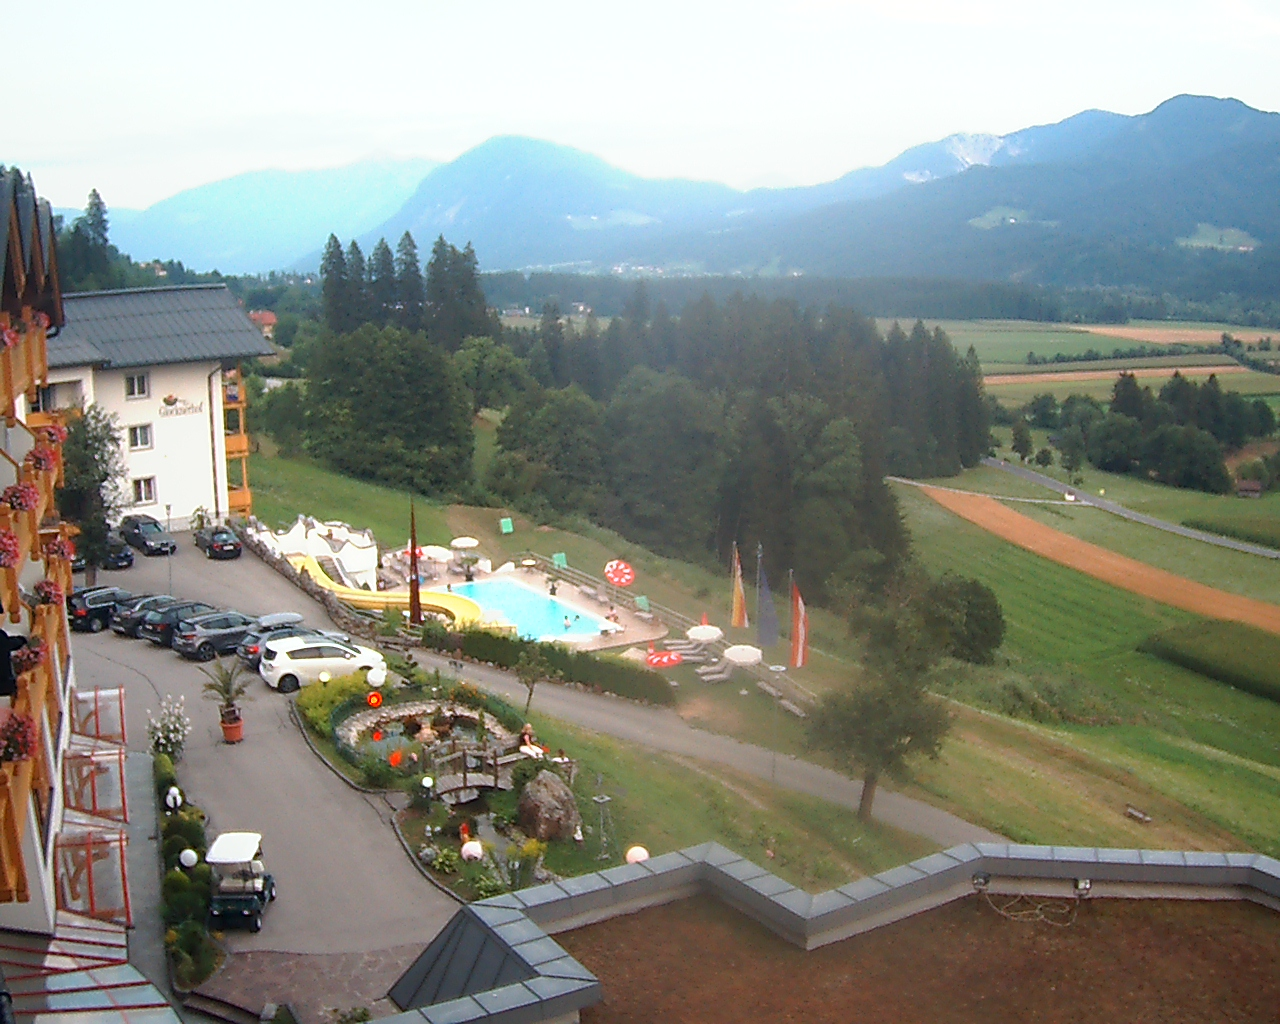 Berg im Drautal Austria  city photos gallery : Berg im Drautal in diretta! Webcam e Hotel Berg im Drautal, Austria ...